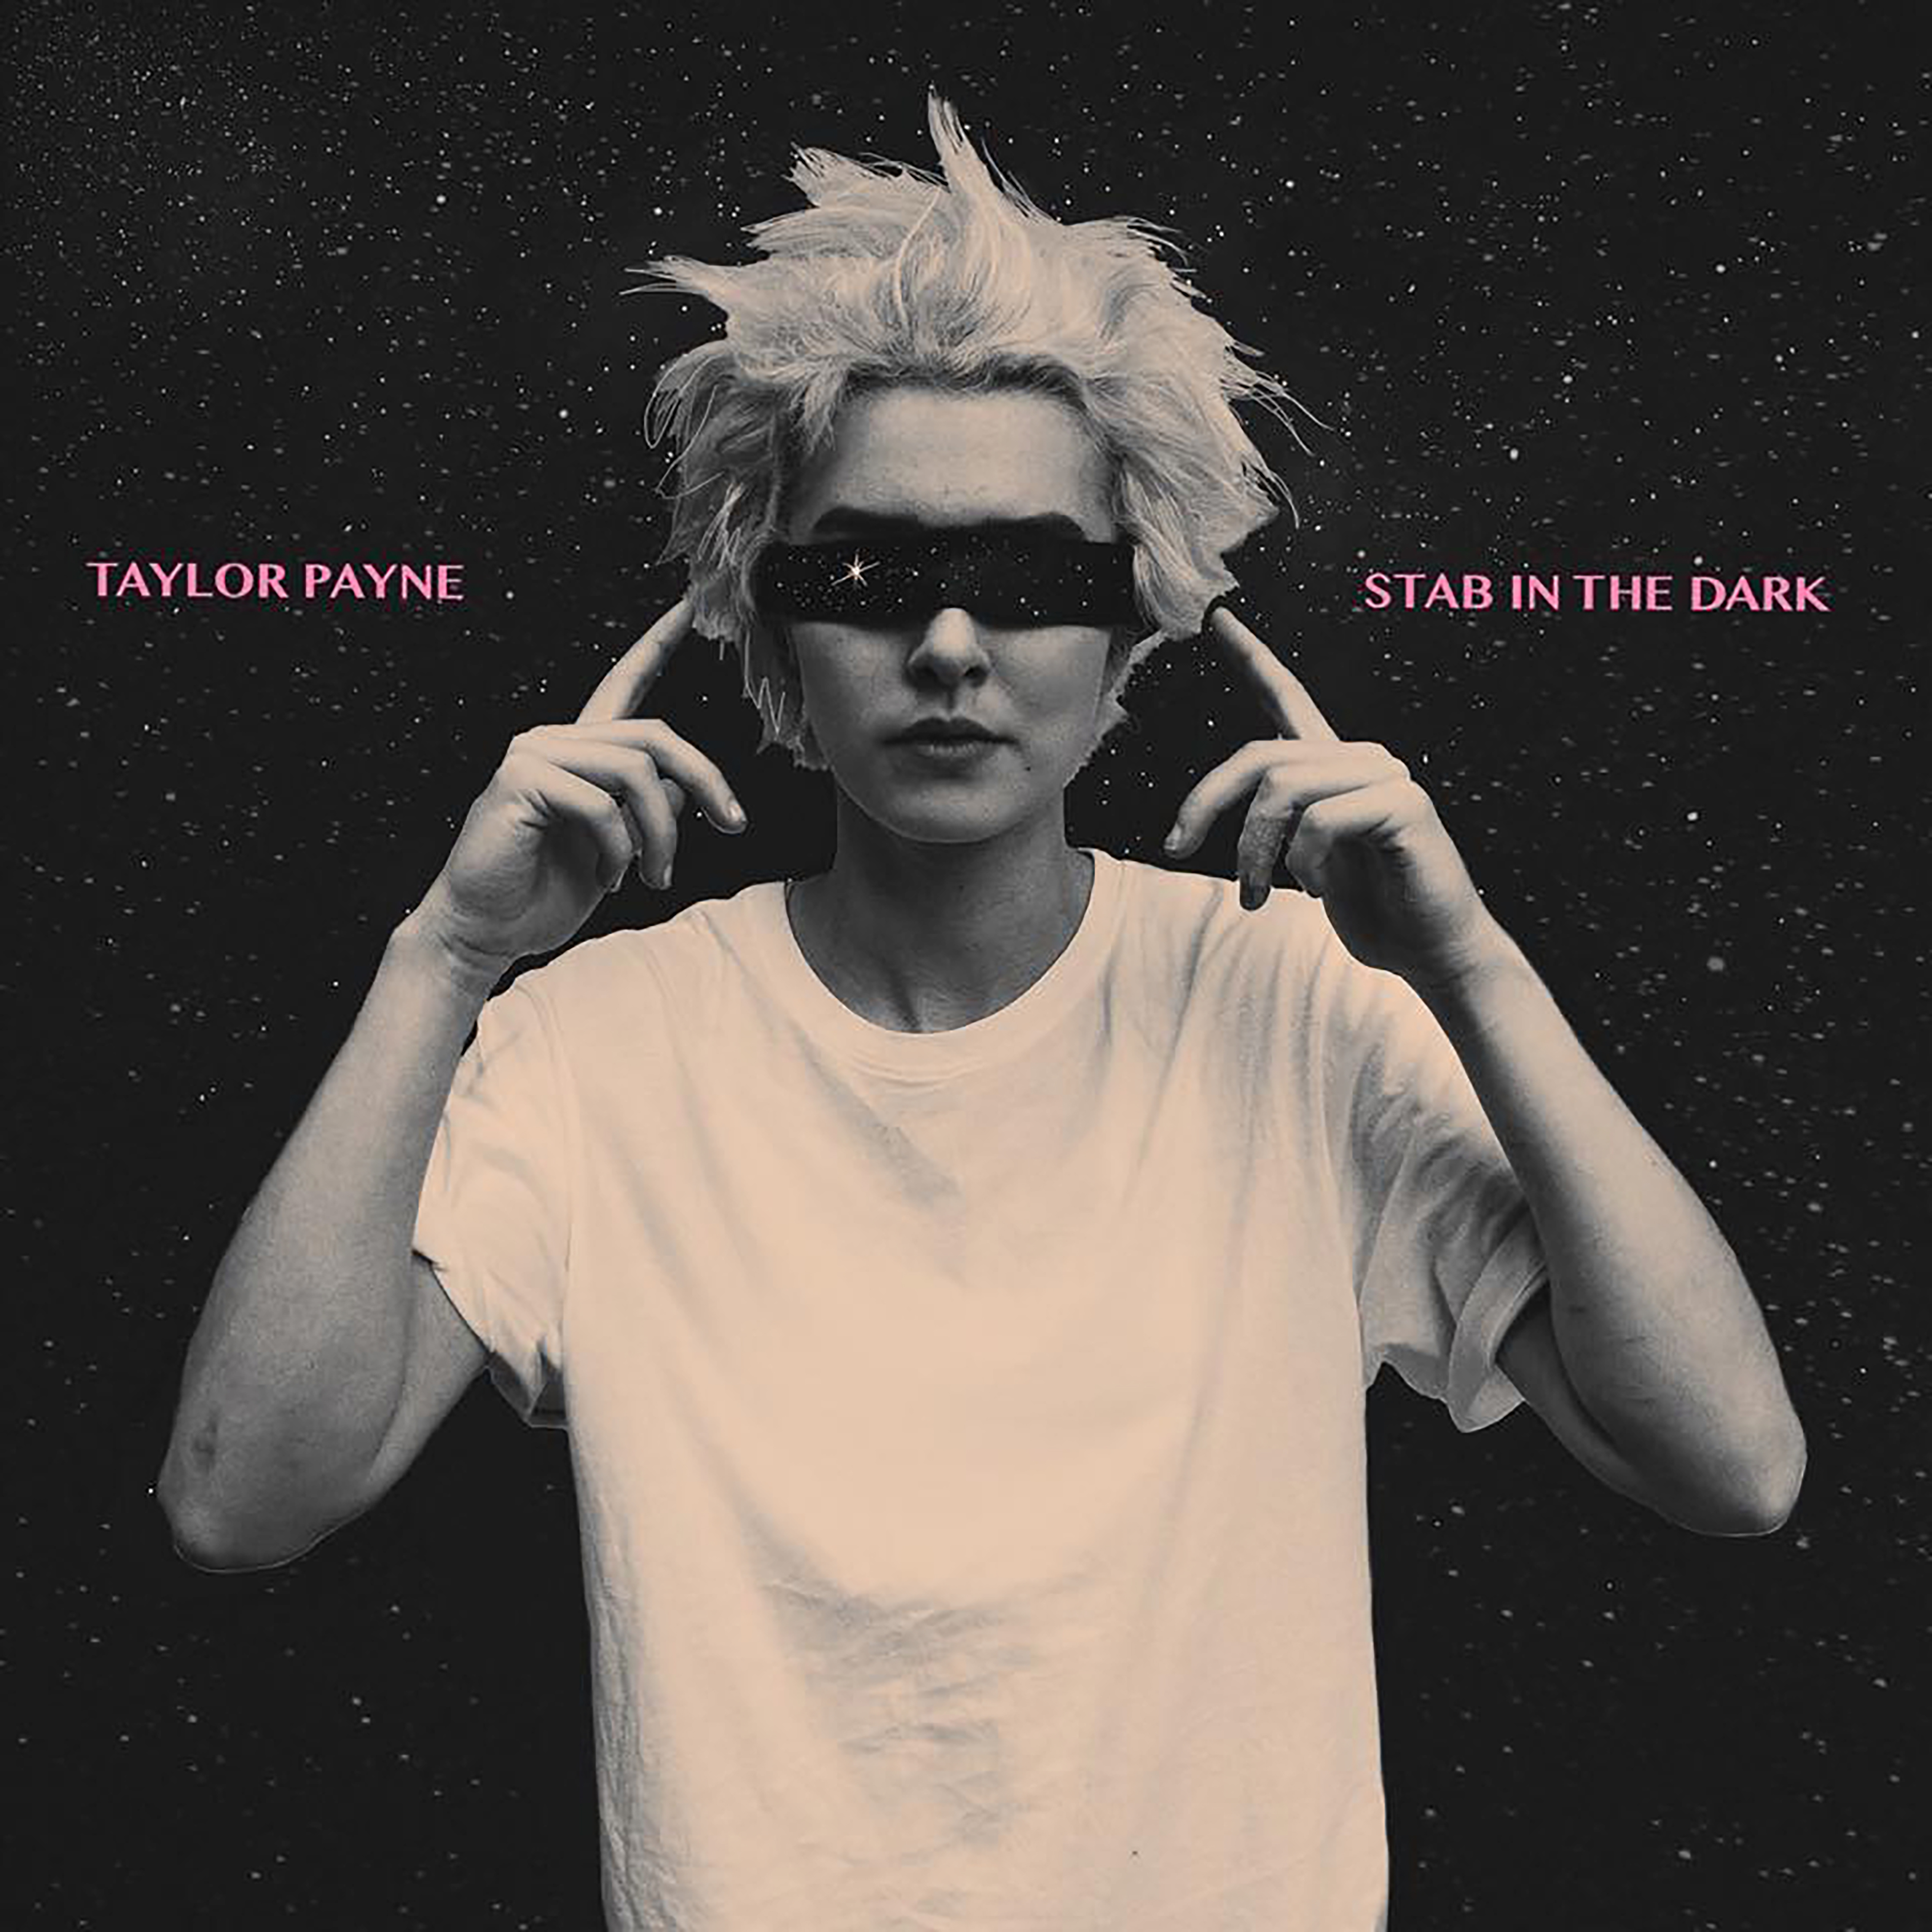 Stab in the Dark - Taylor Payne